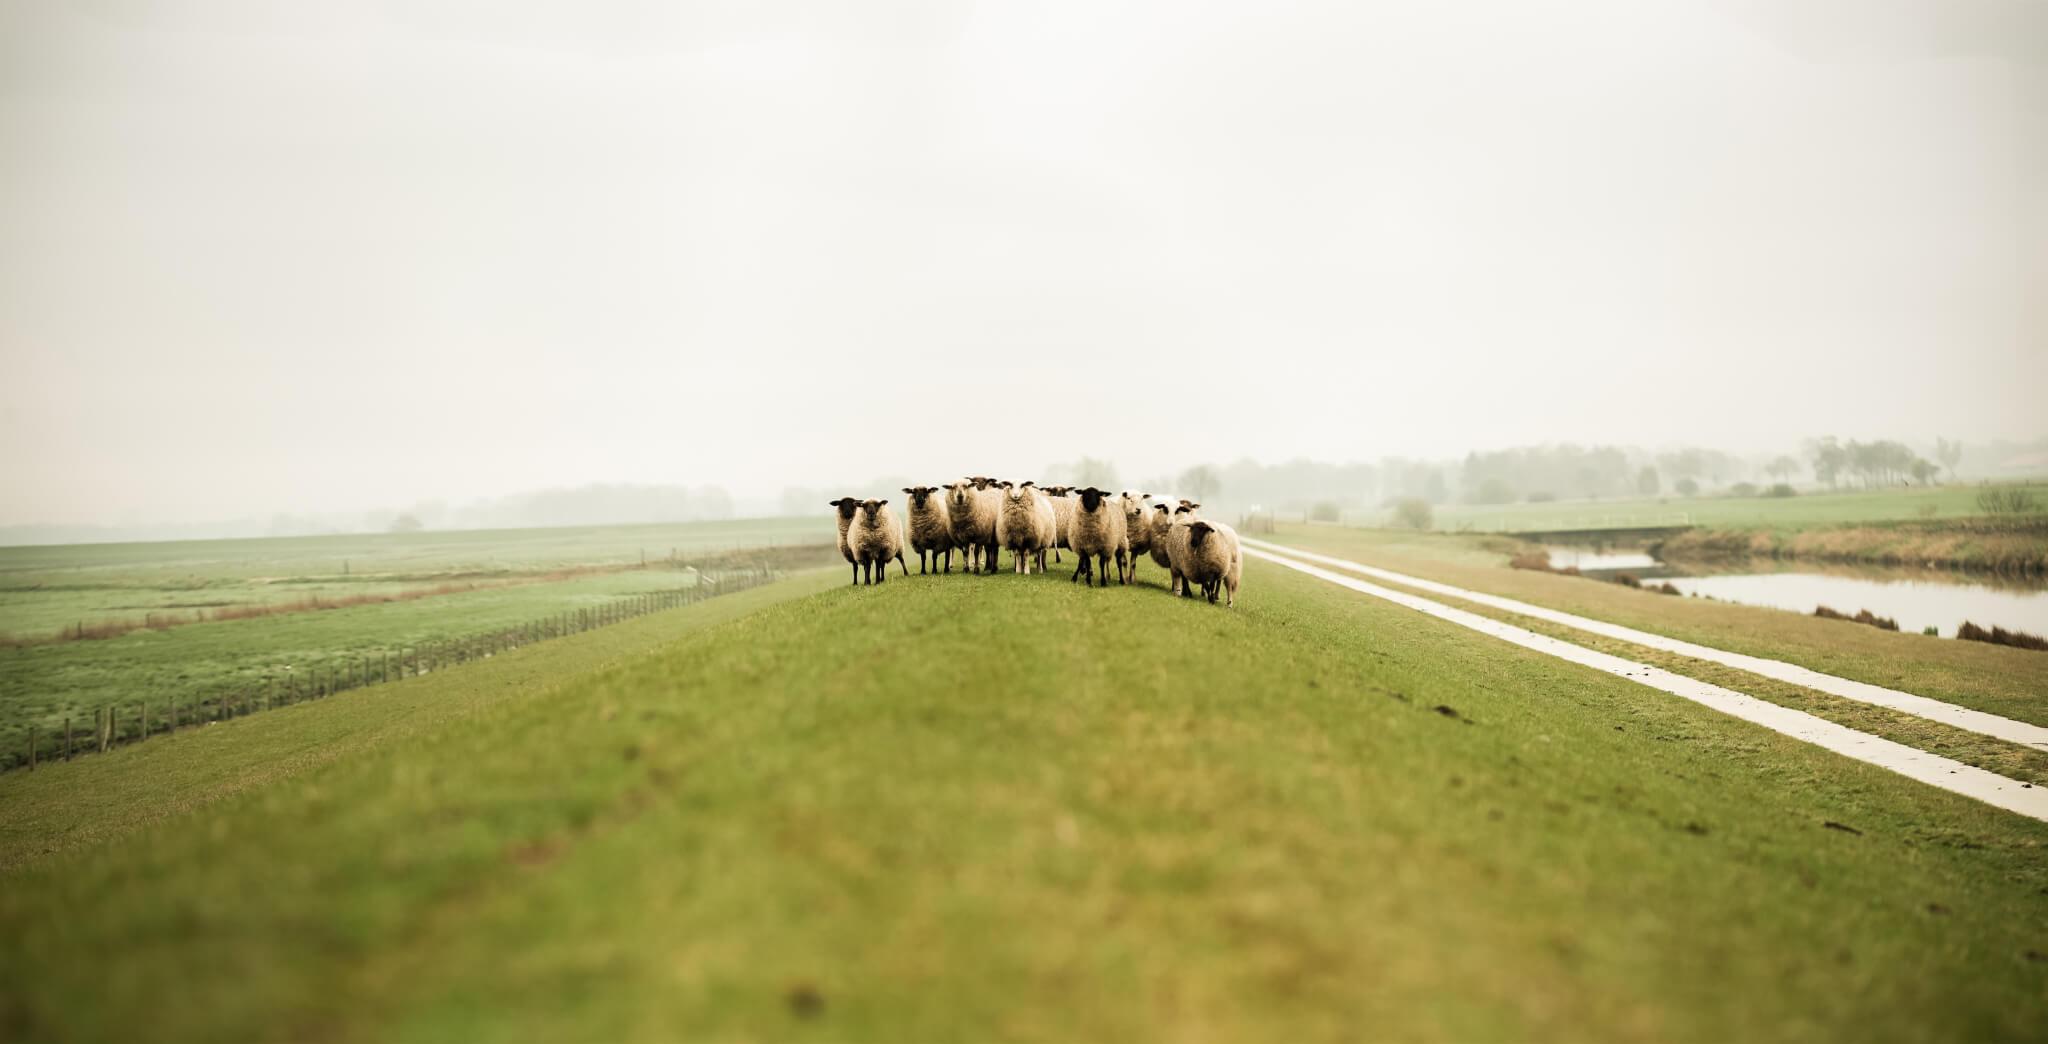 Follow the leader - Photo by Pablo Heimplatz